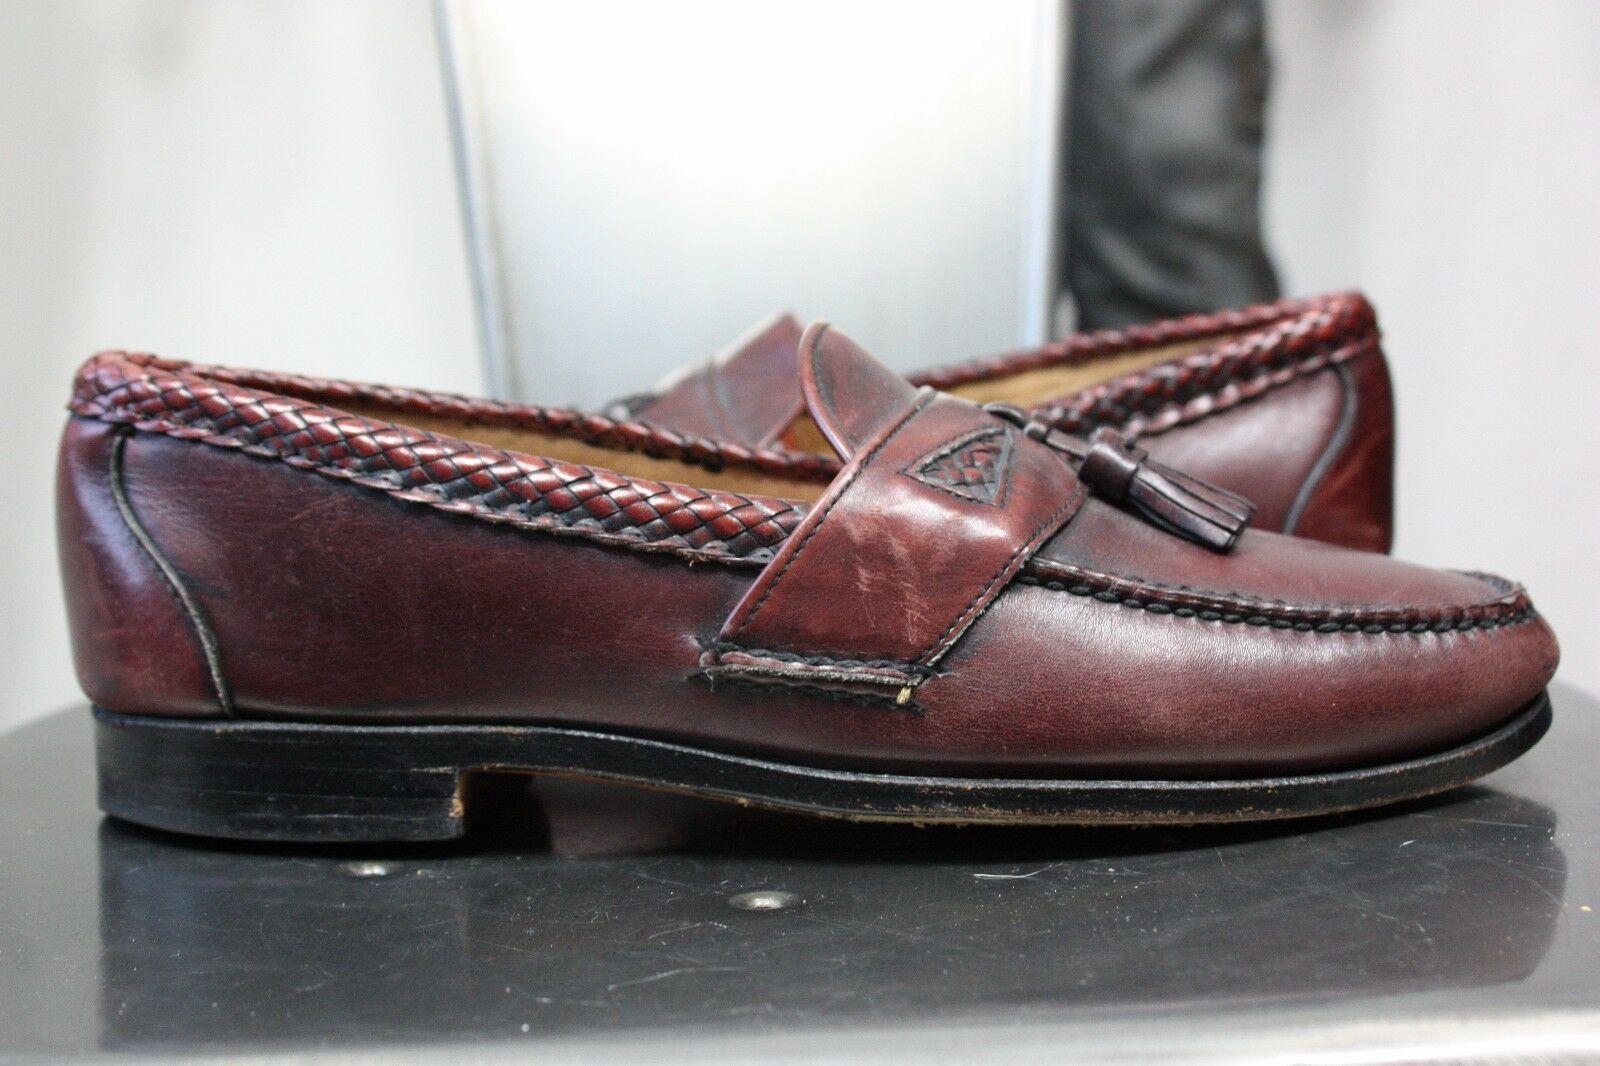 Maroon Color Apron Toe Genuine Leather Handmade Tassel Loafer Slip Ons Men Shoes